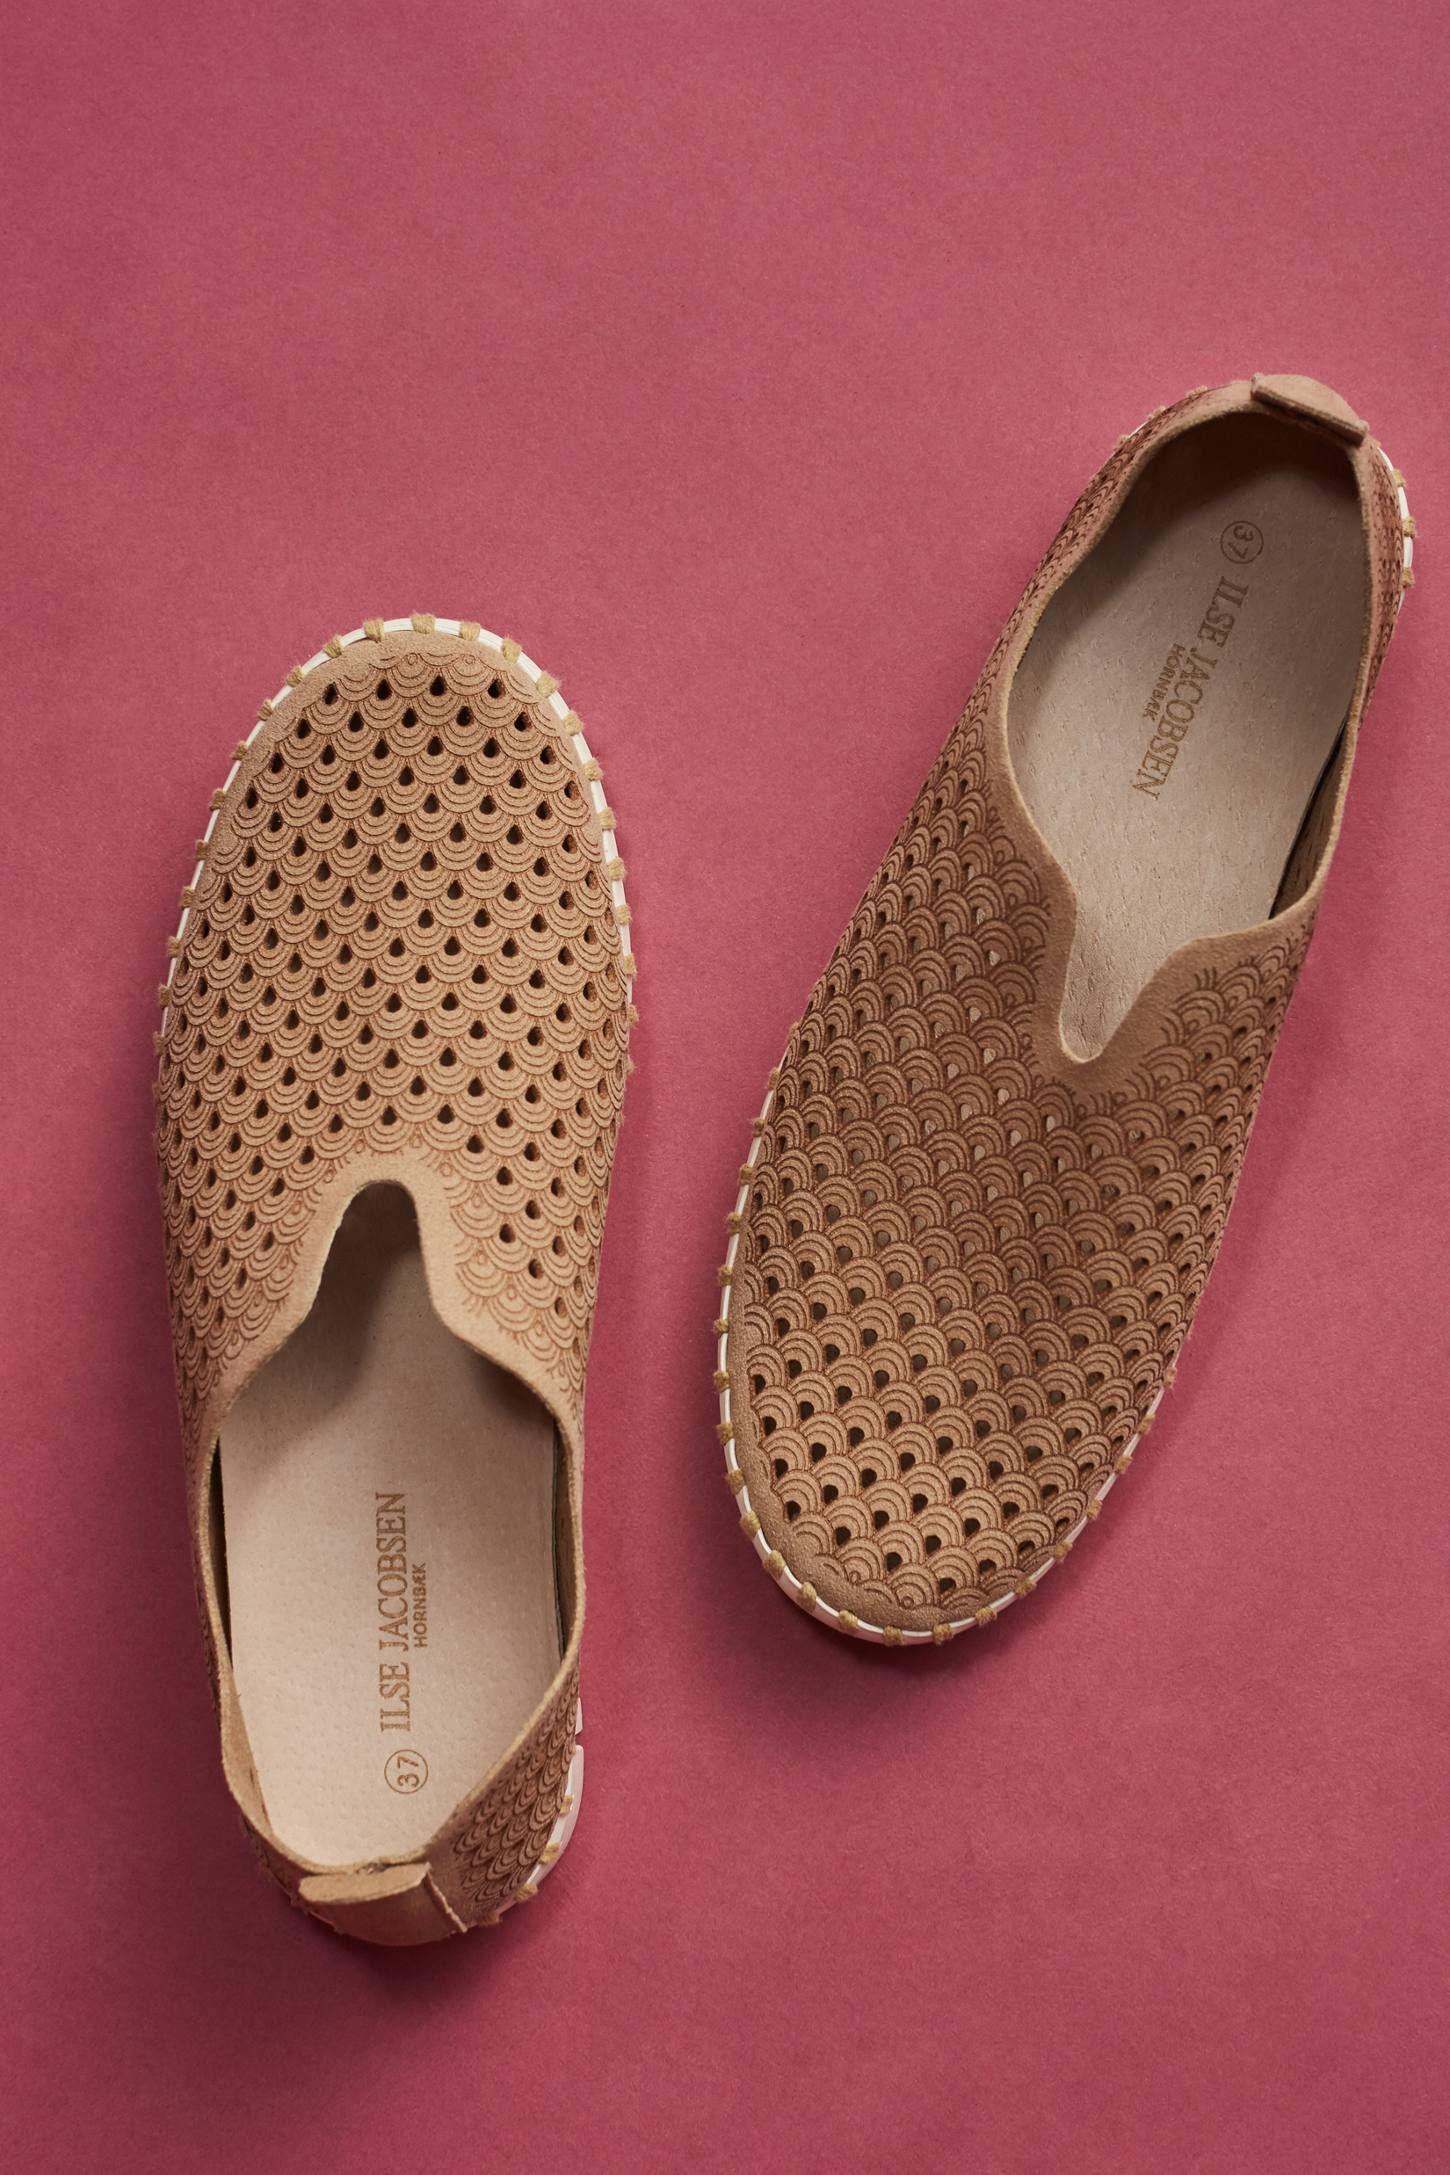 e0dd8728 Slide View: 5: Ilse Jacobsen Tulip Perforated Sneakers Sandalias Planas,  Anthropologie, Tulipanes